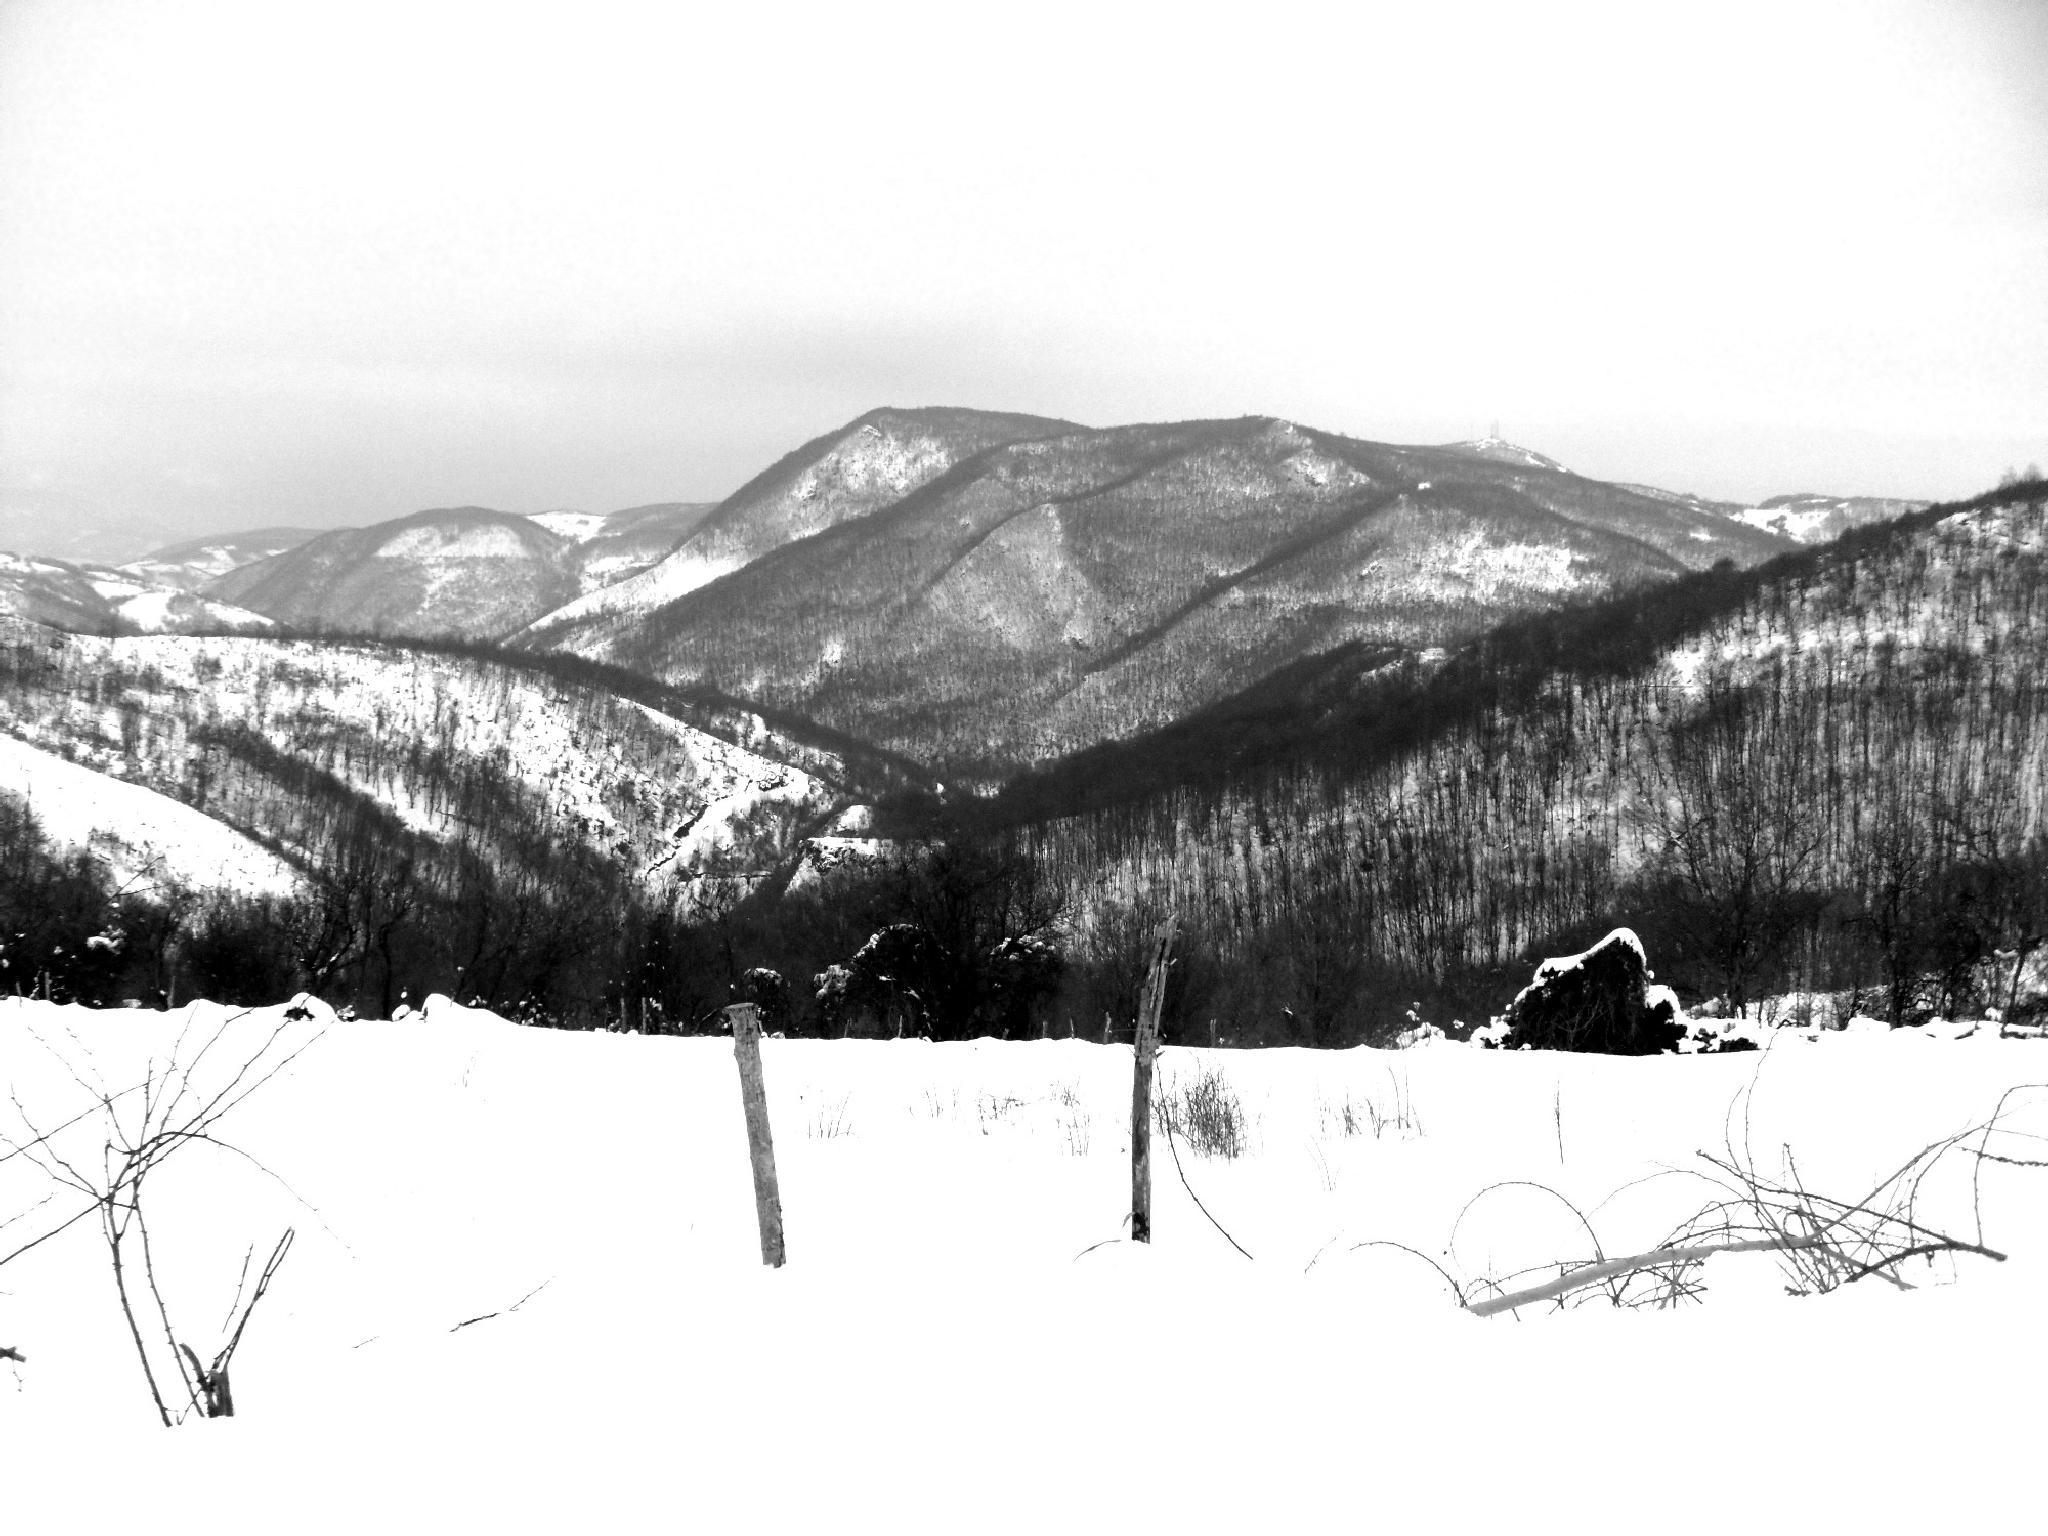 Soft Winter by Mensur H. Luma